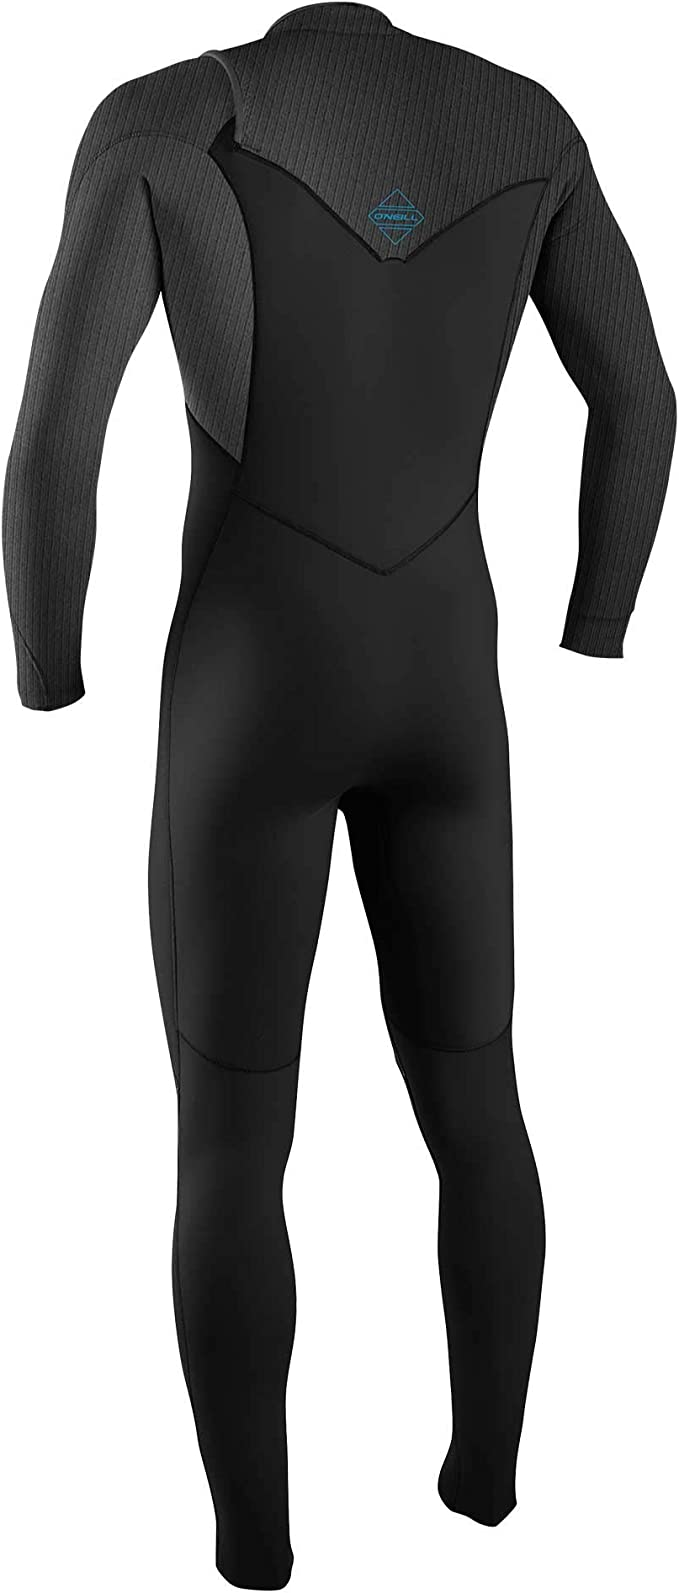 Amazon.com : O'NEILL Hyperfreak 3/2+mm Chest-Zip Full Wetsuit - Men's :  Sports & Outdoors